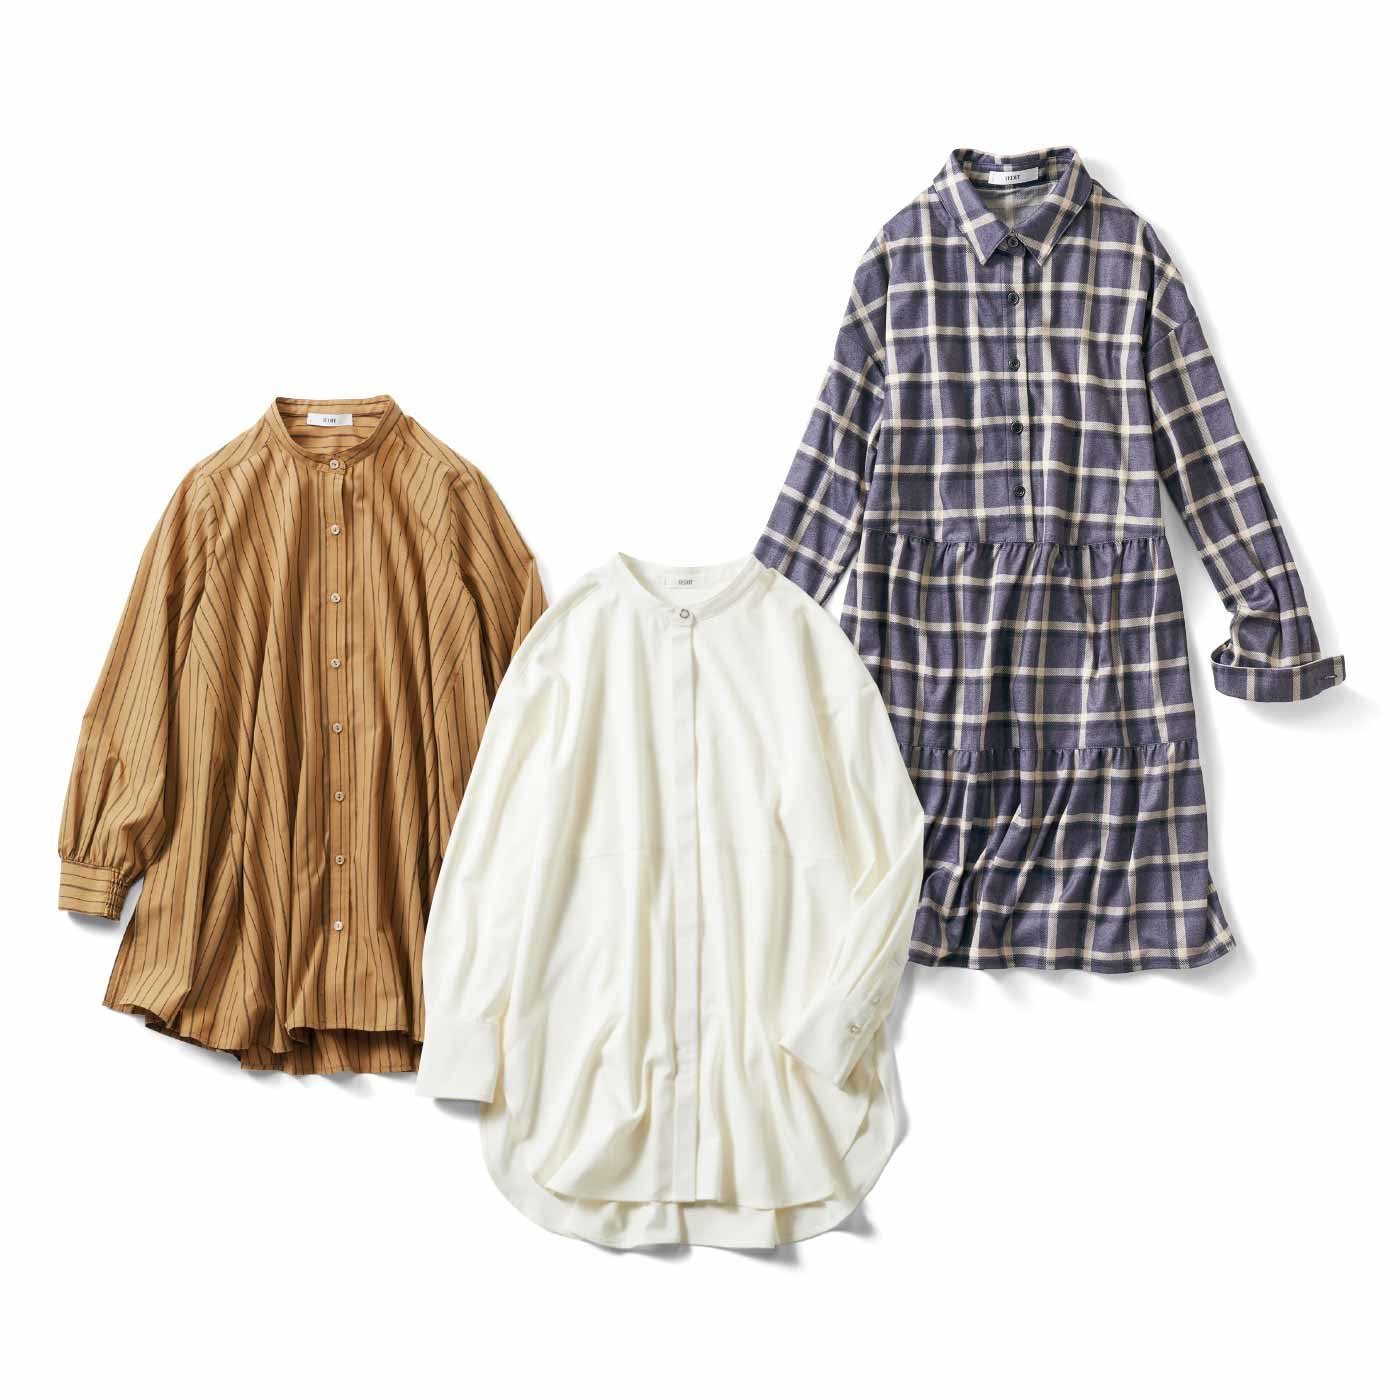 IEDIT[イディット] きちんと感とリラックス感のある 微糖デザインのロングシャツの会(3ヵ月エントリー)